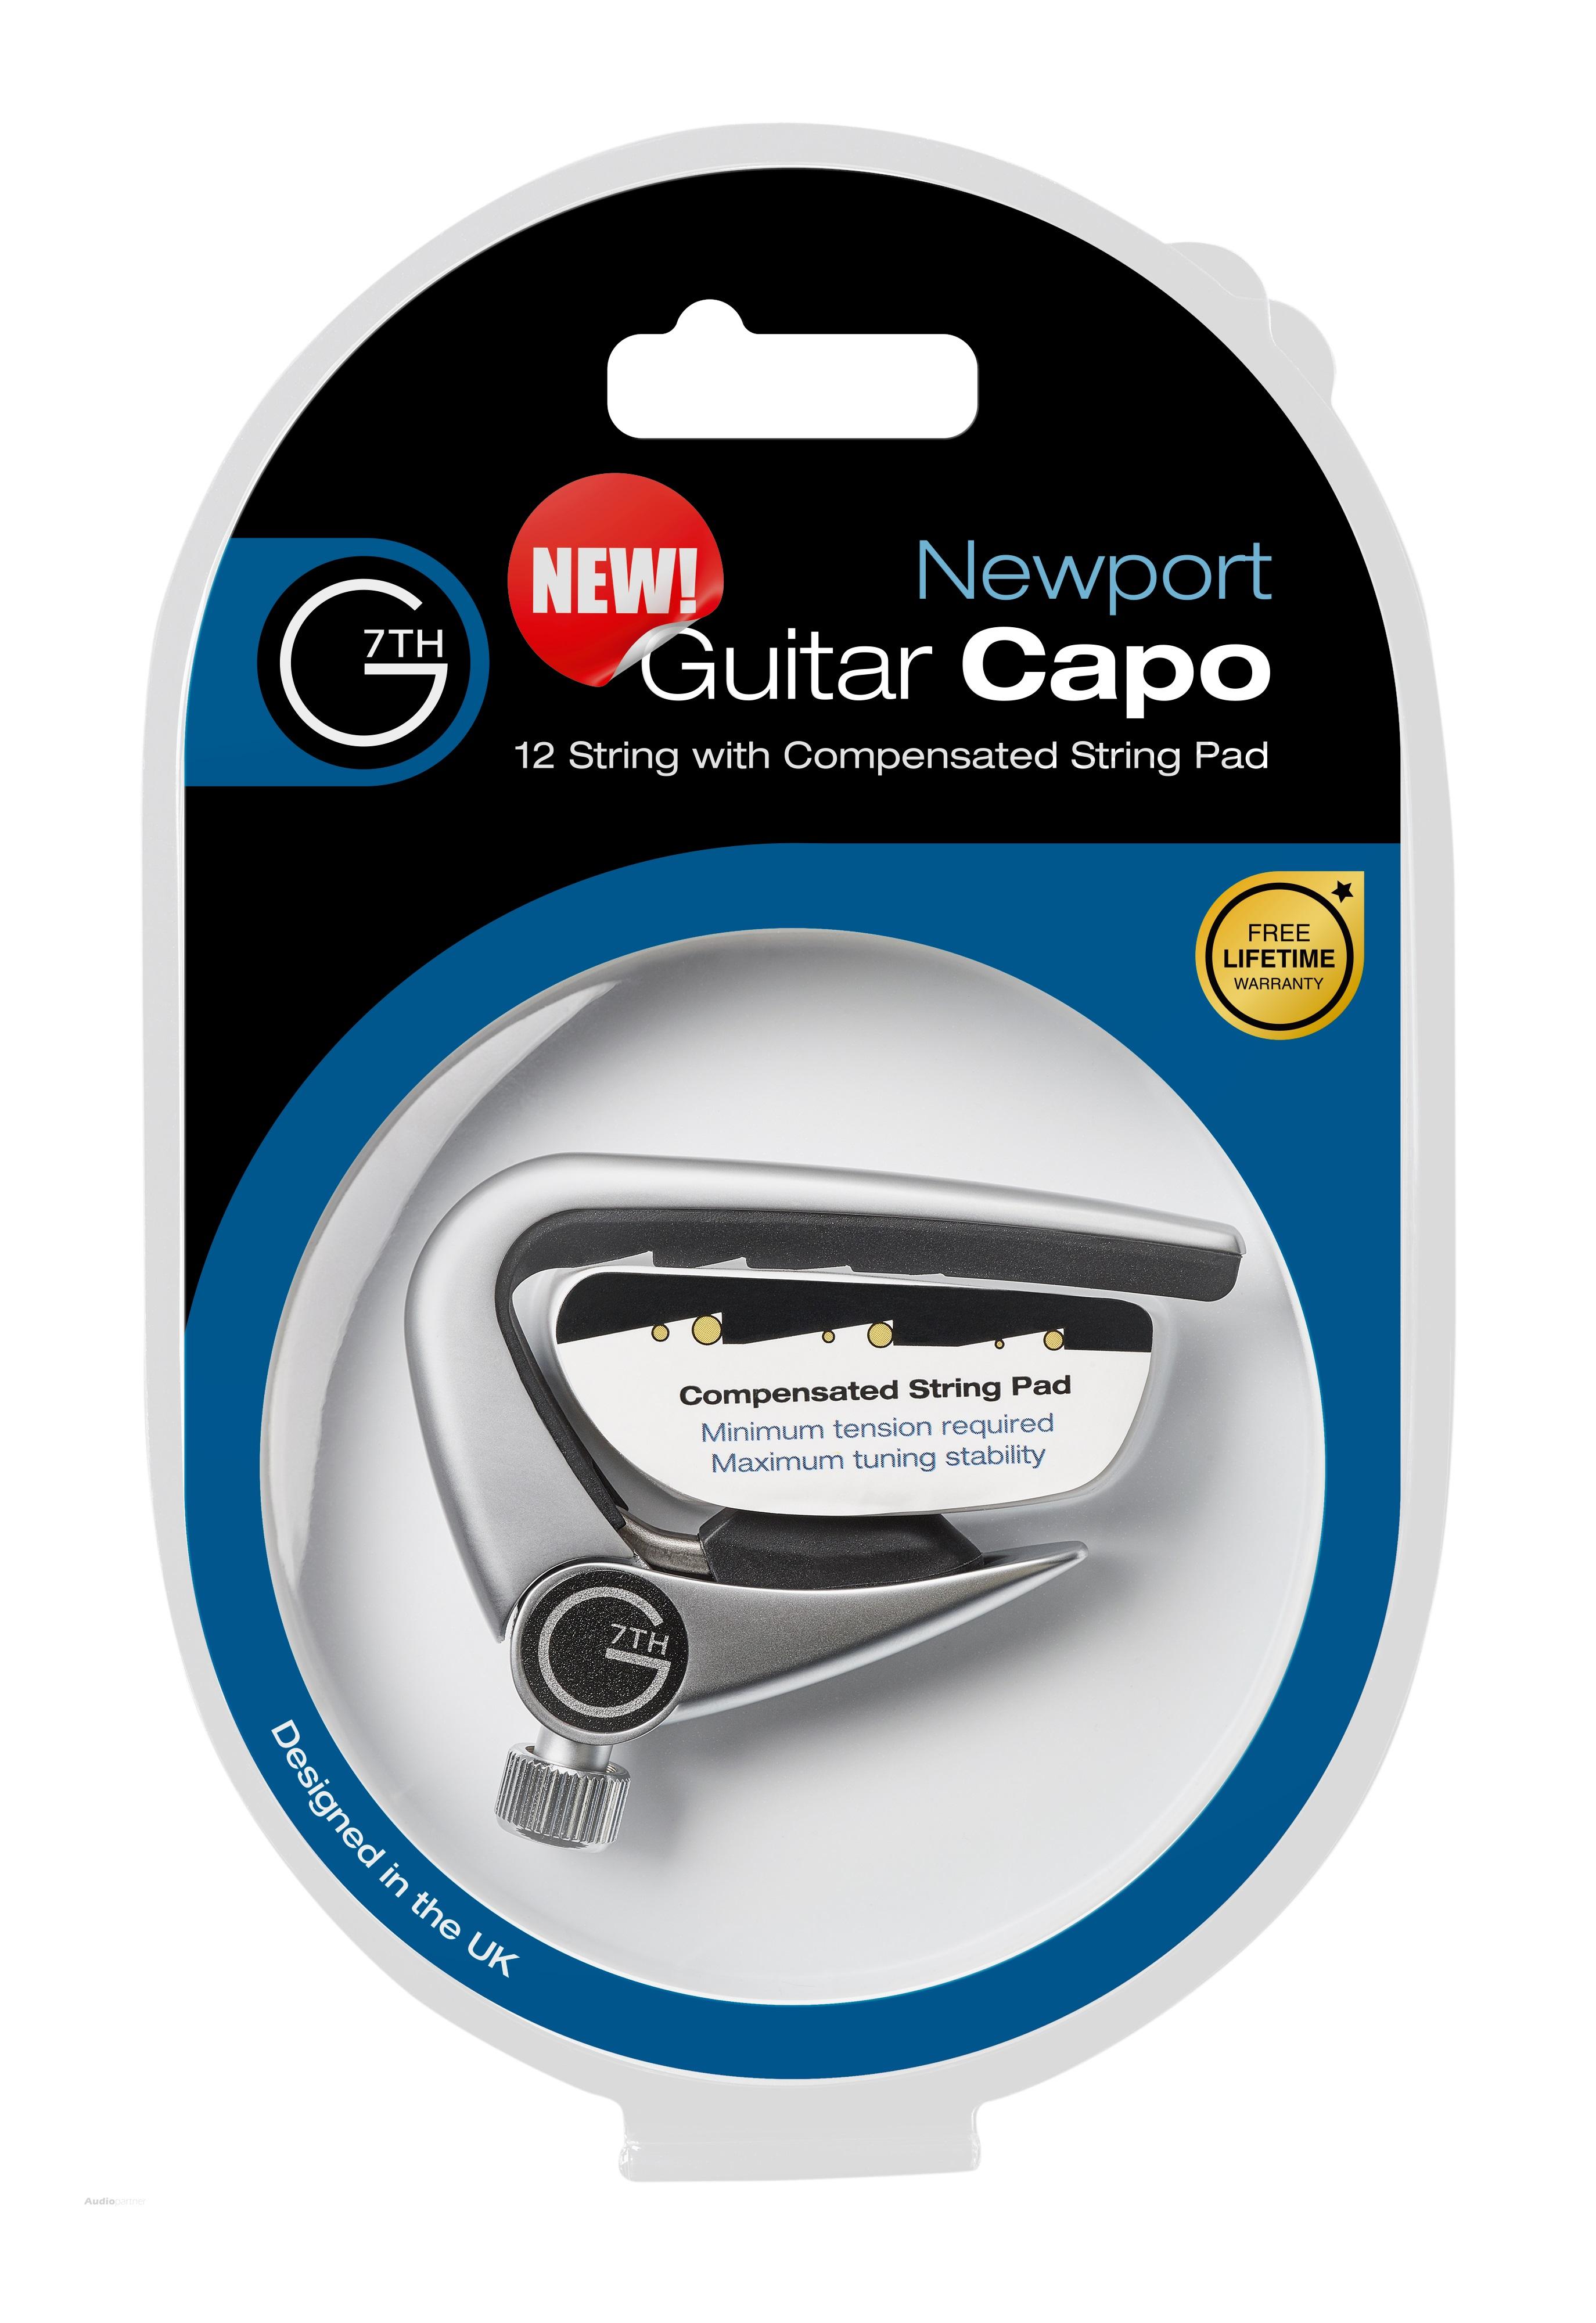 G7TH Newport 12-String Silver